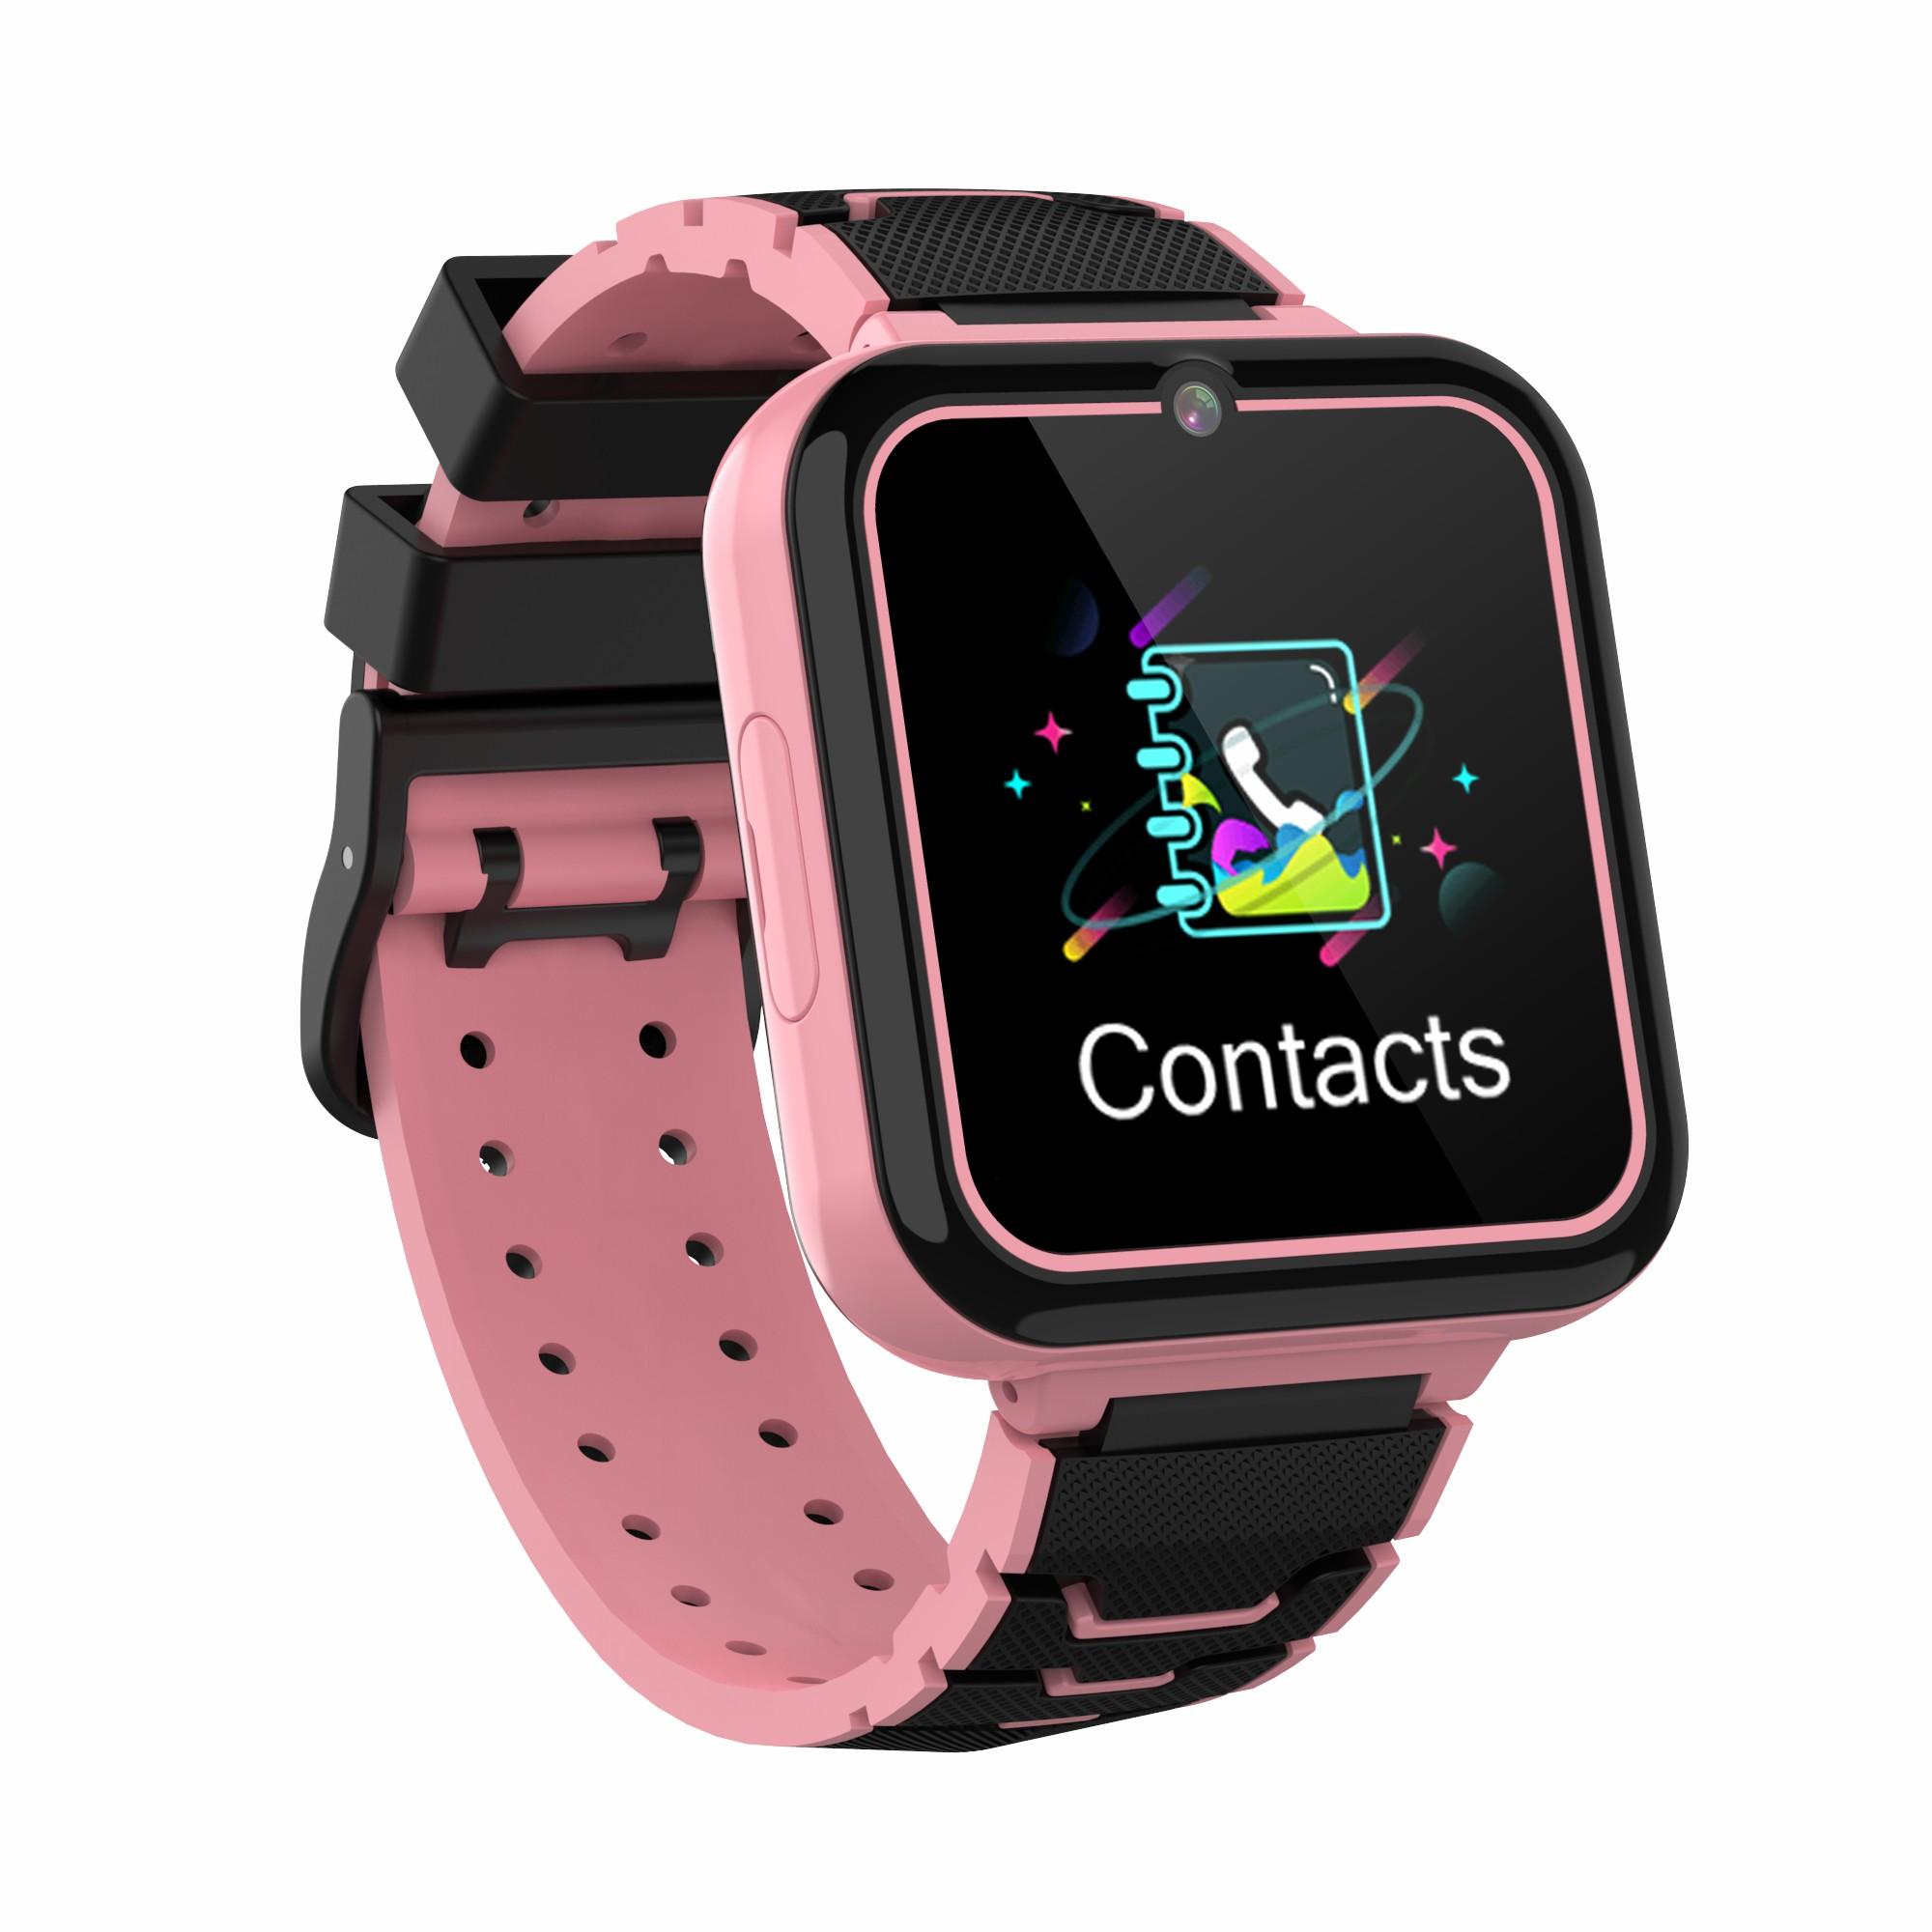 Y16 Kids Smart Watch Multi-language Ips Screen Game Camera Video Phone Smartwatch Pink